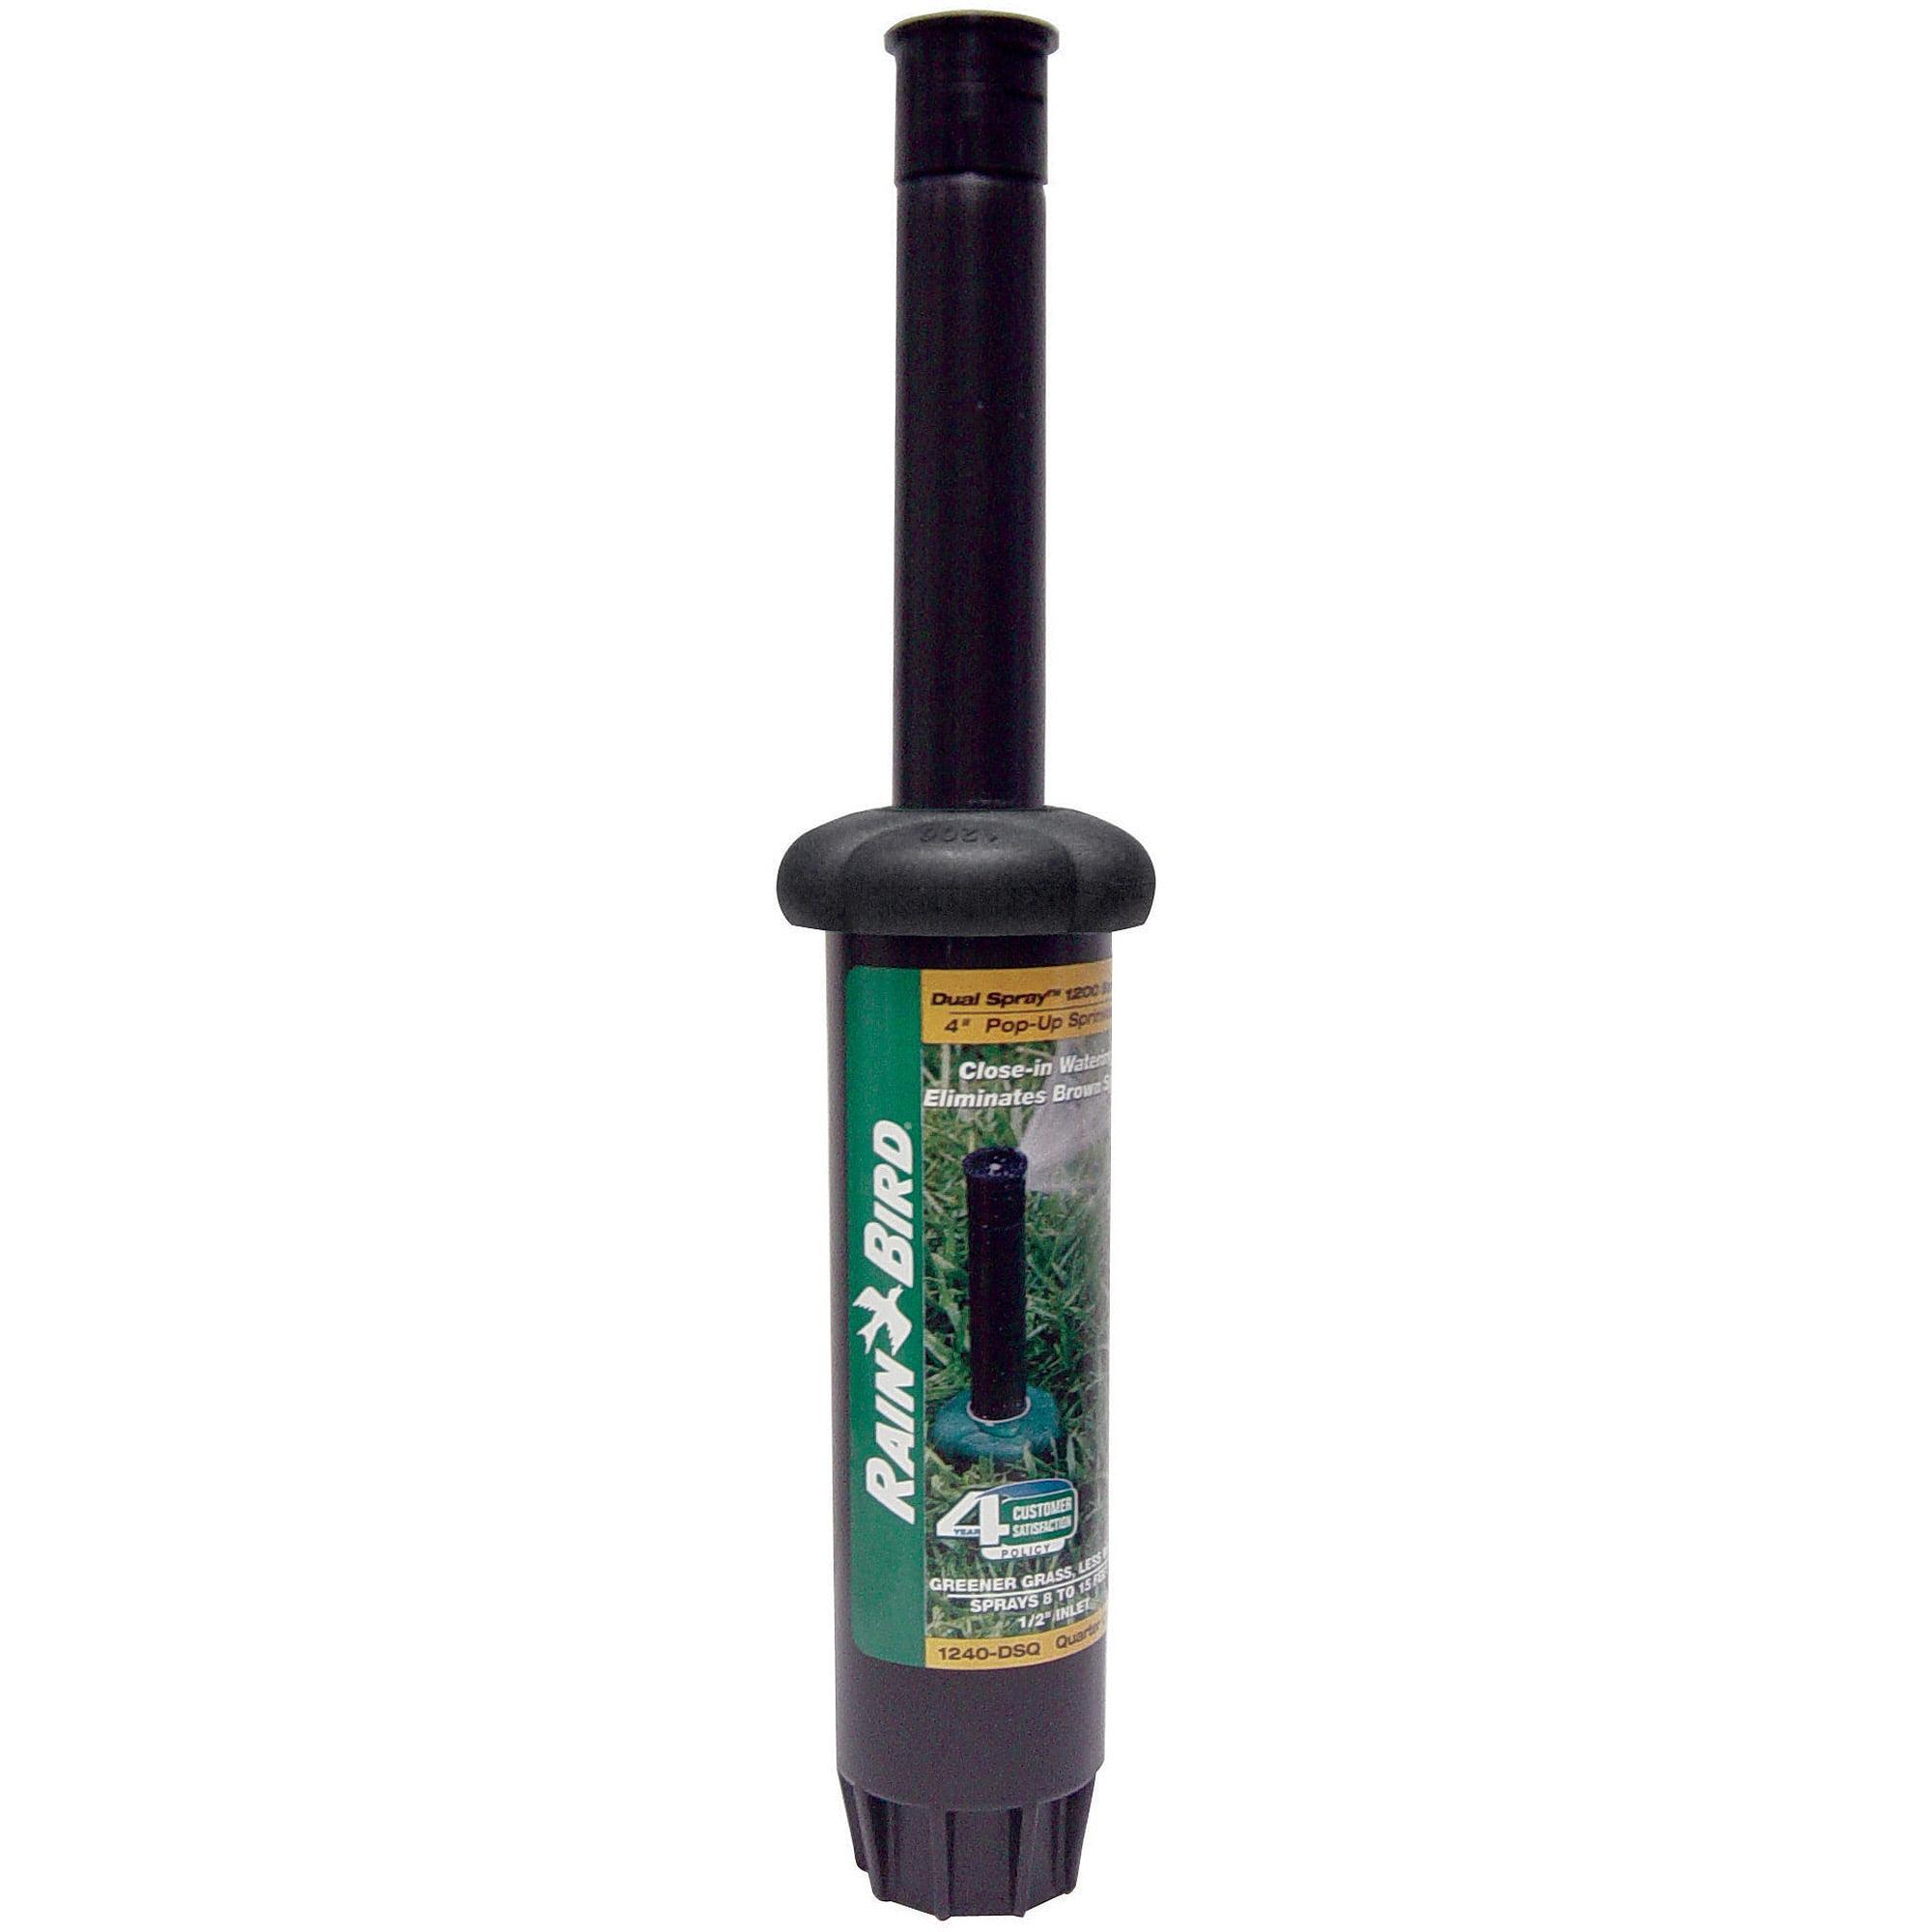 Rain Bird 1240DSQ Pop-Up Sprinkler Head, 19 to 32-ft Spray Radius by RAINBIRD